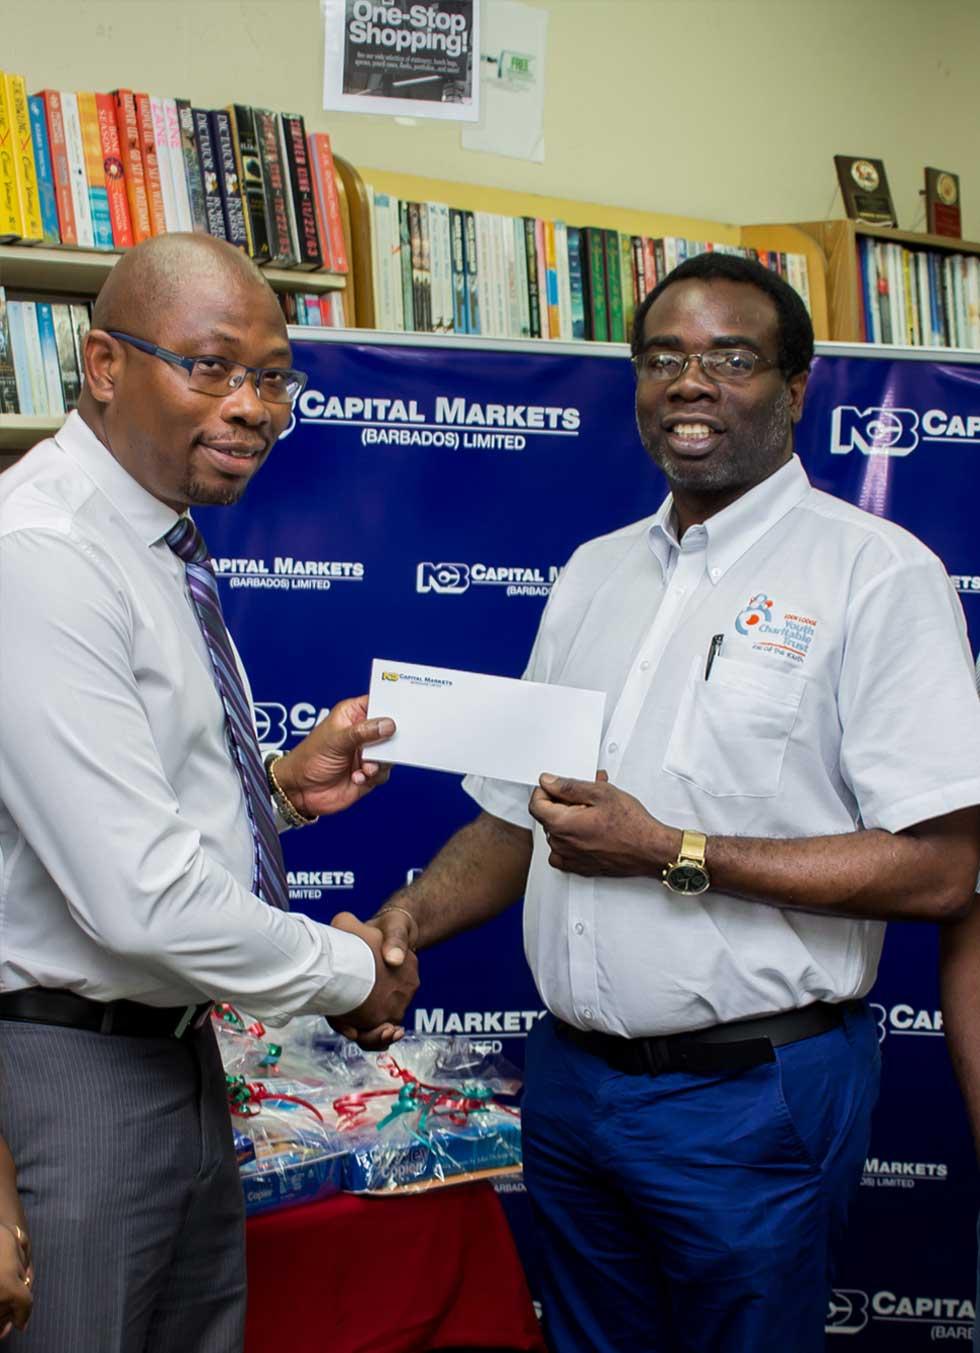 award from Charitable Trust